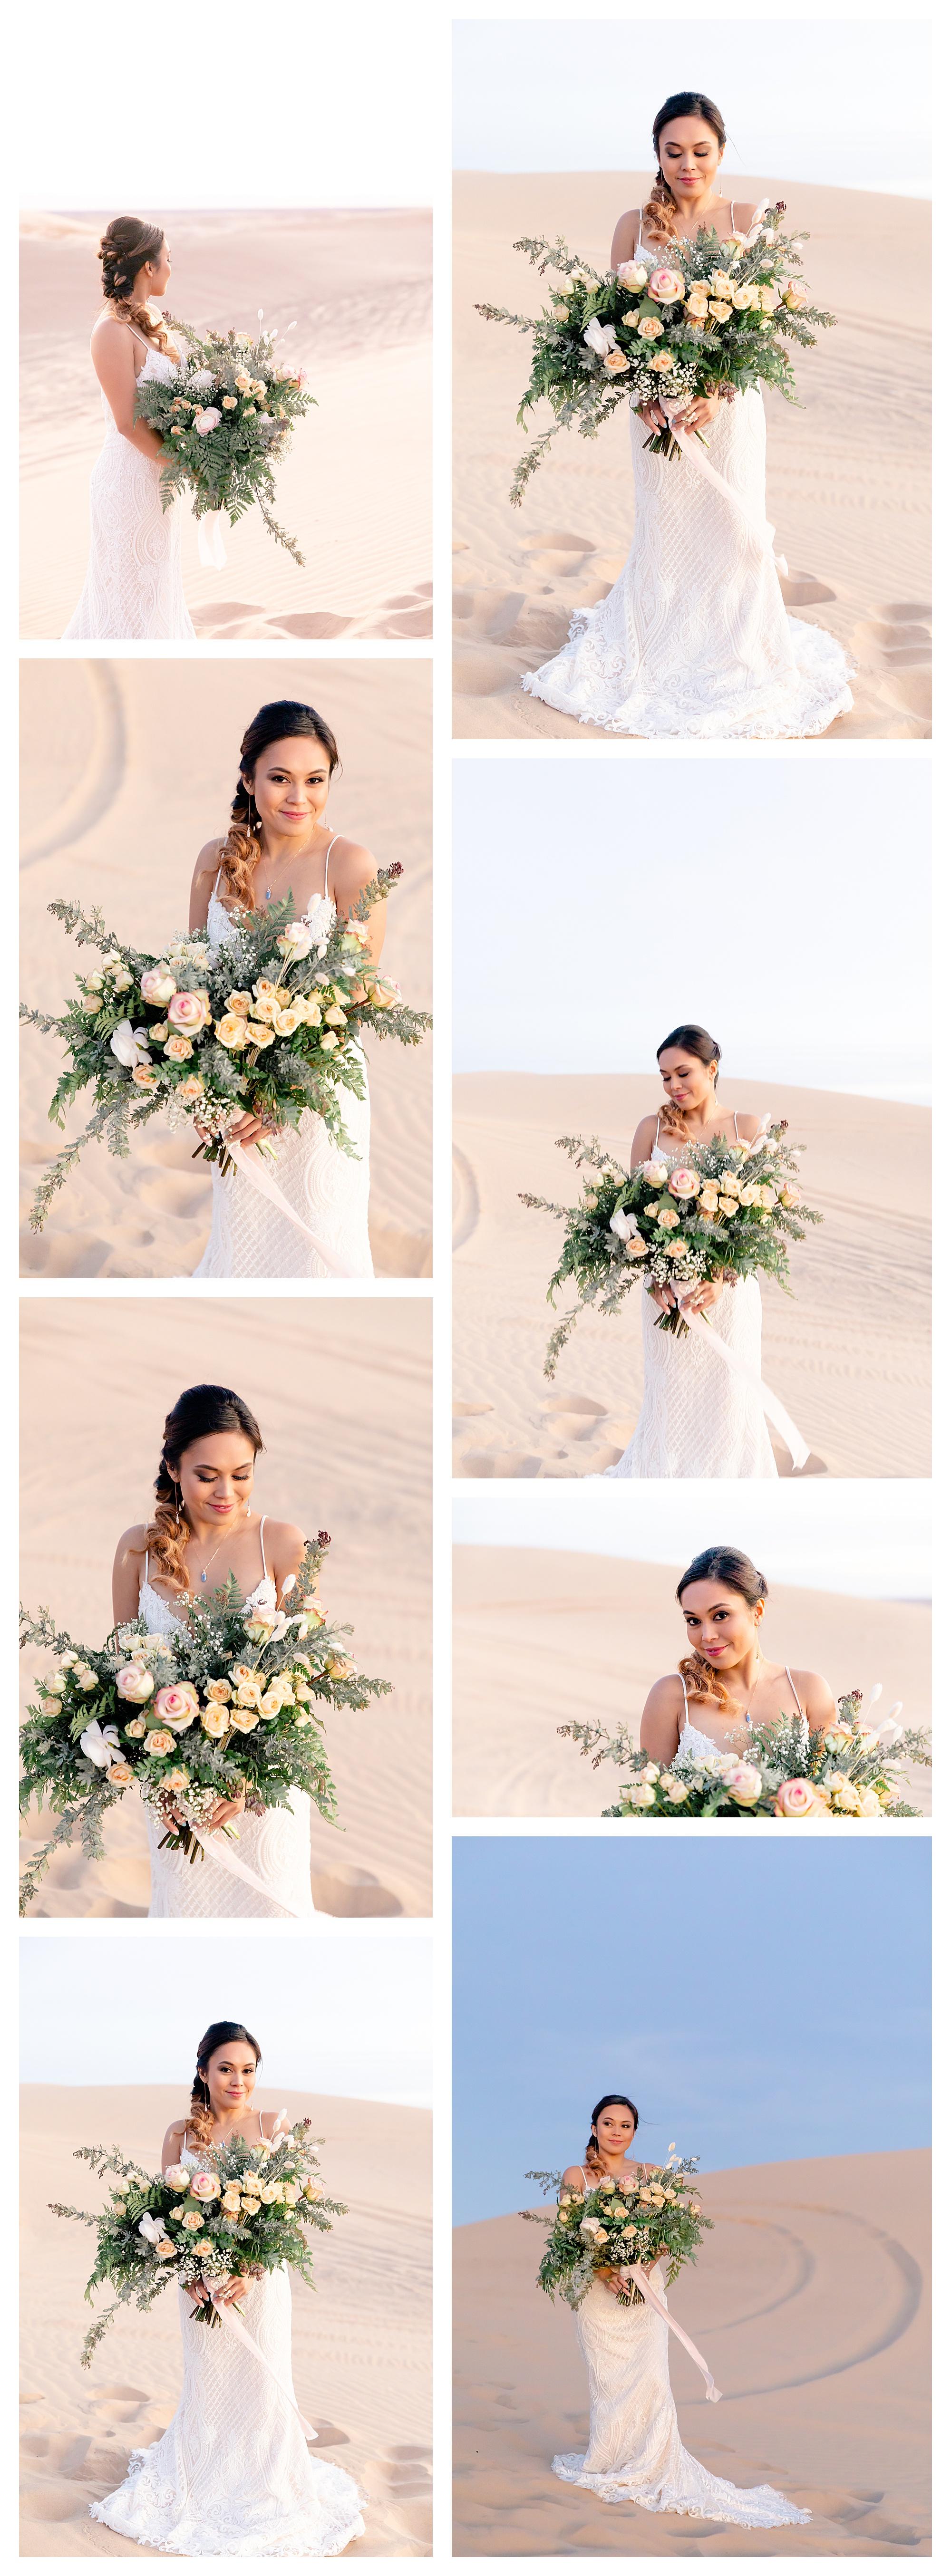 Sand Dunes Bridal Shoot Southern California Wedding Elopement Elope